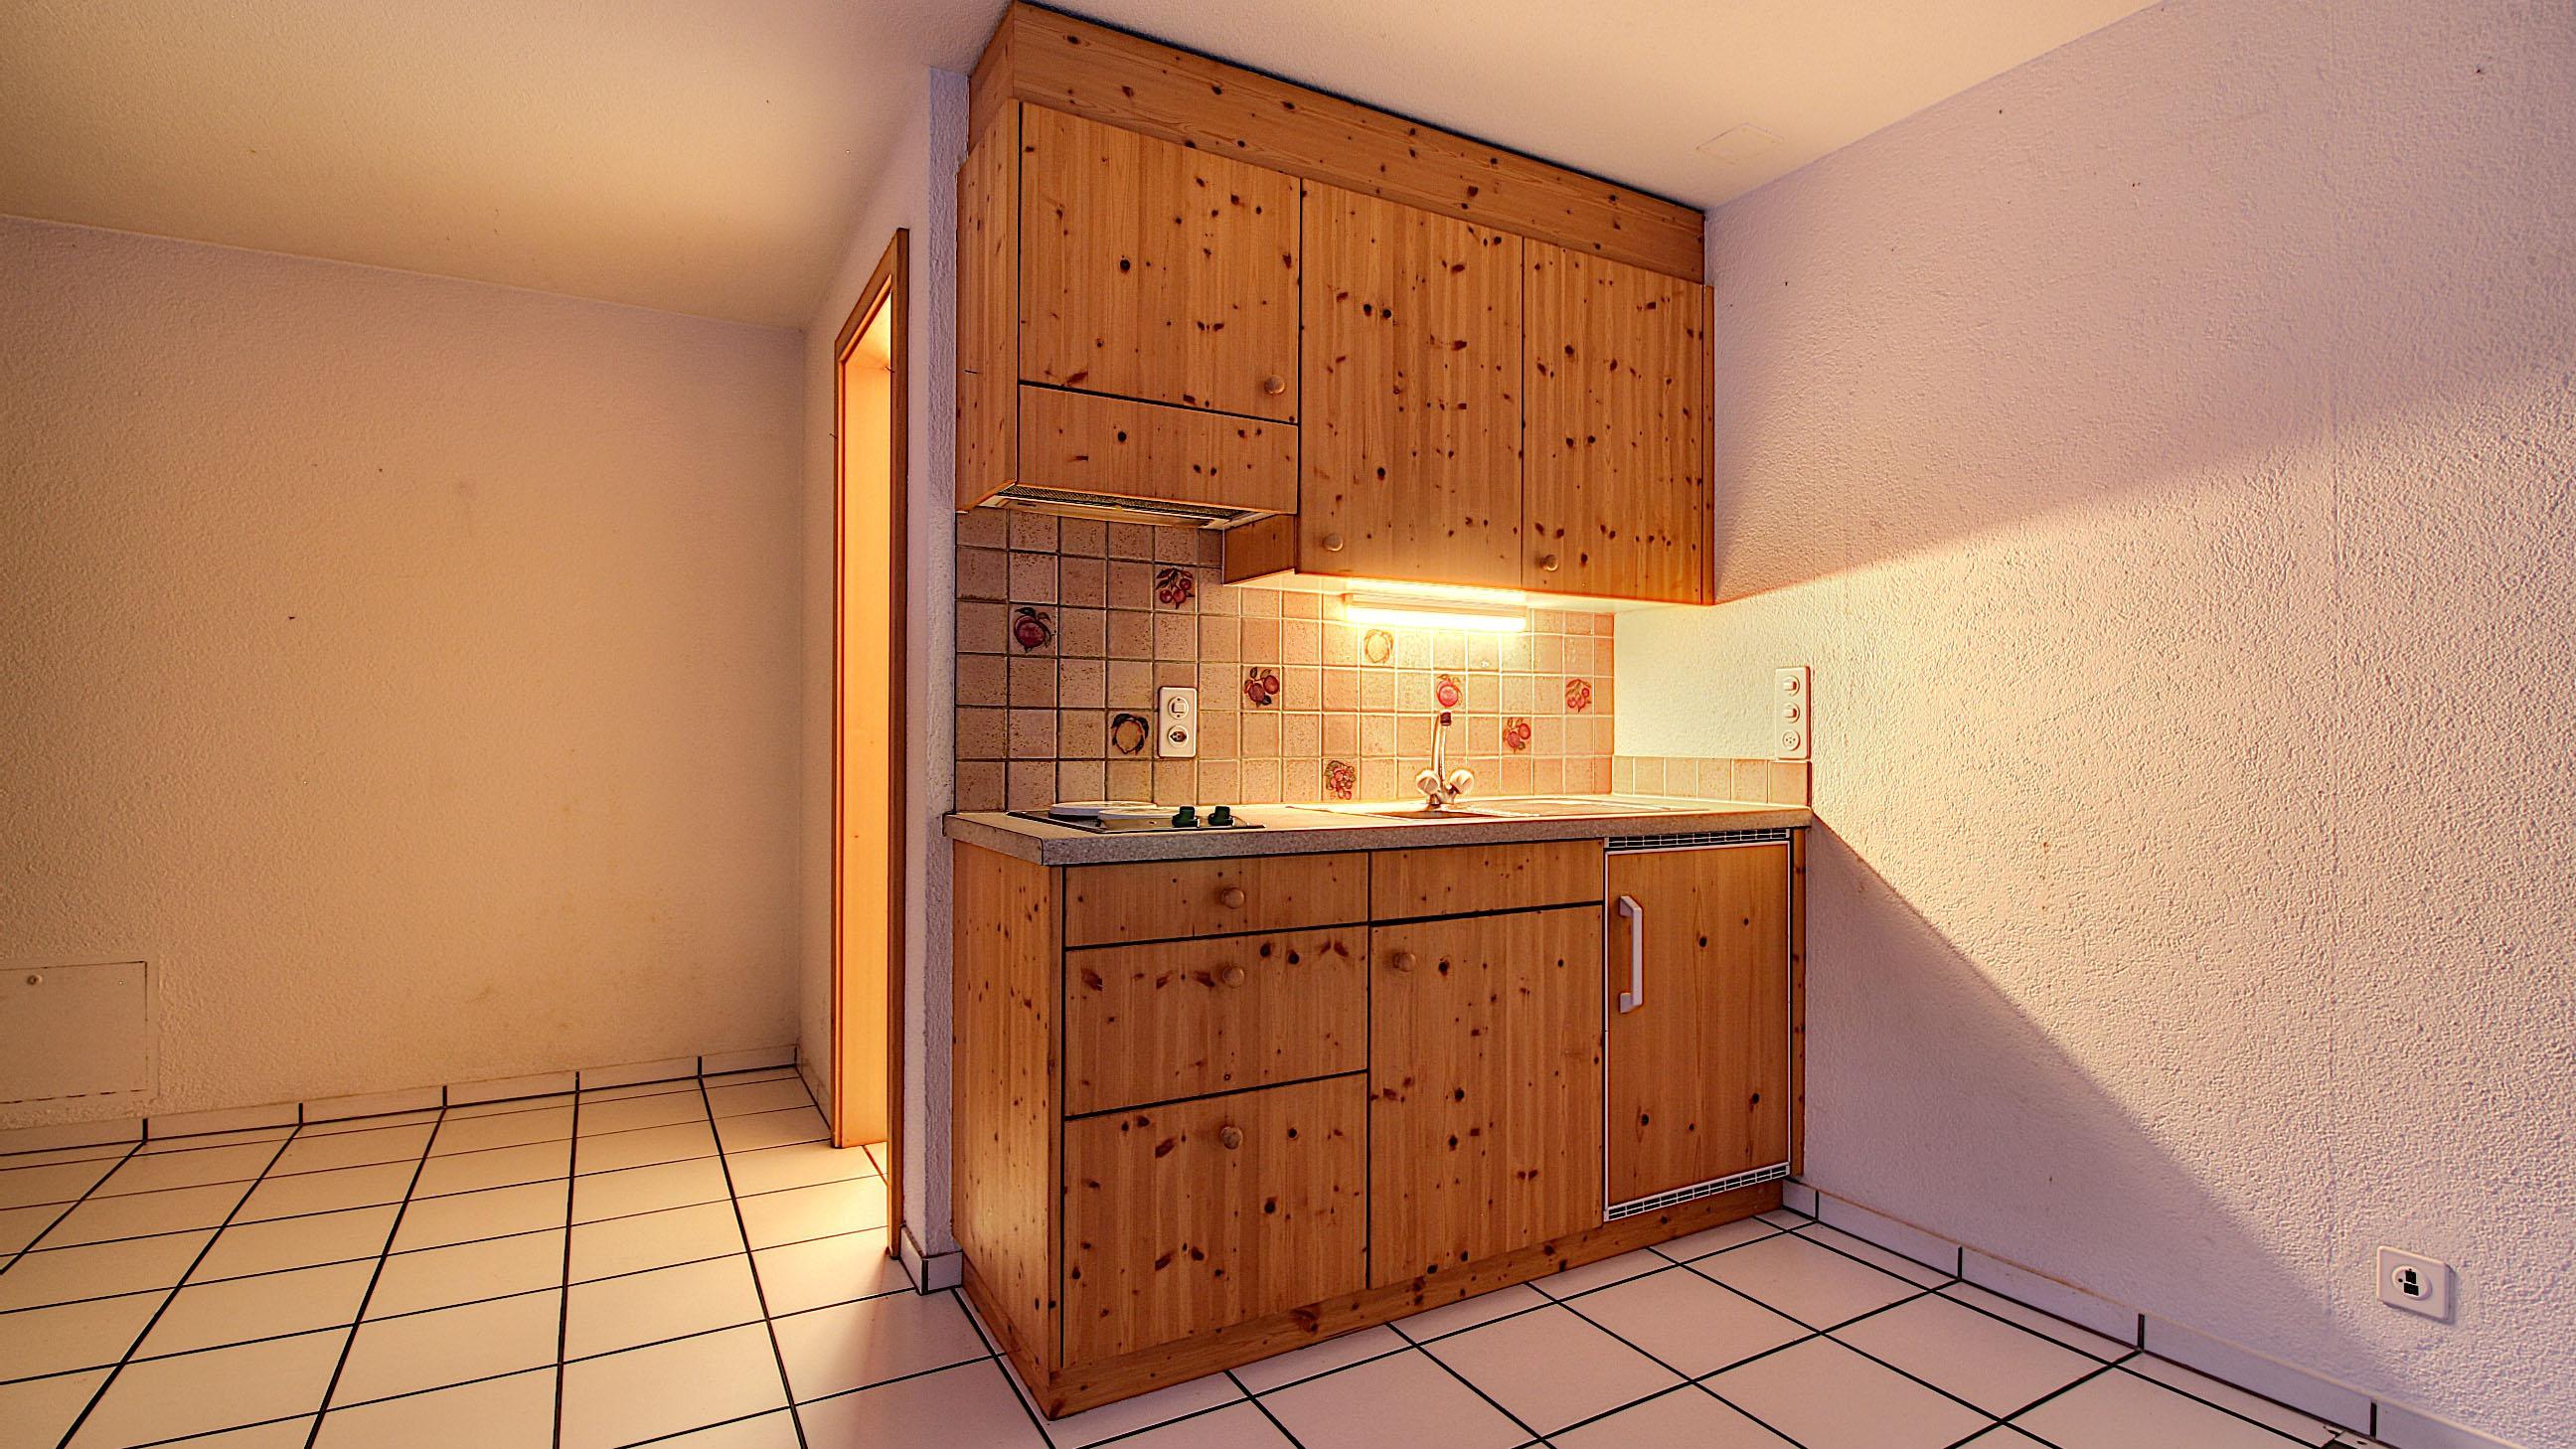 The Doktorhaus Apartments, Switzerland